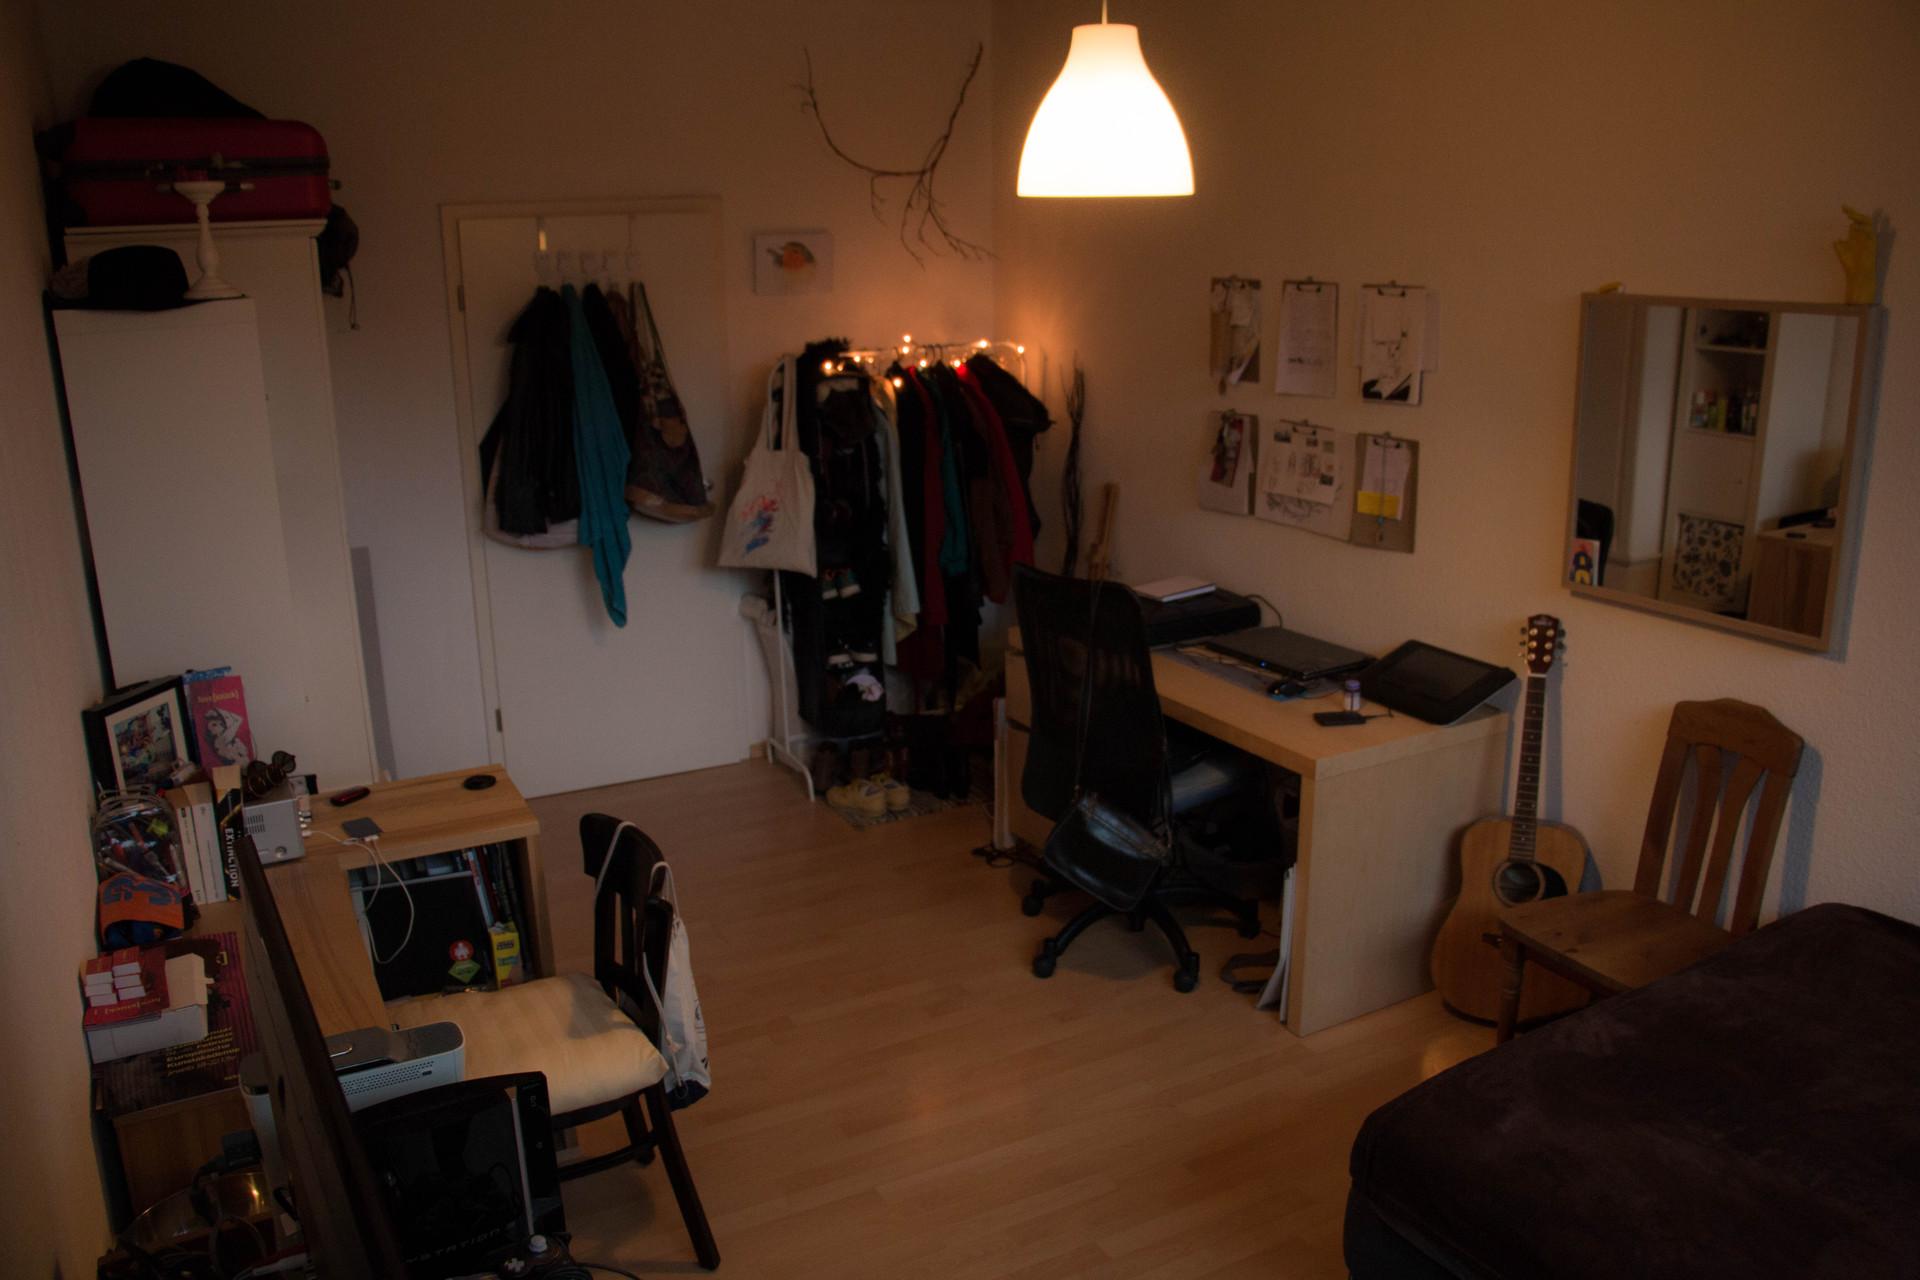 20-m-furnished-room-city-centre-0e0d905eb48a552f59177305783824ae